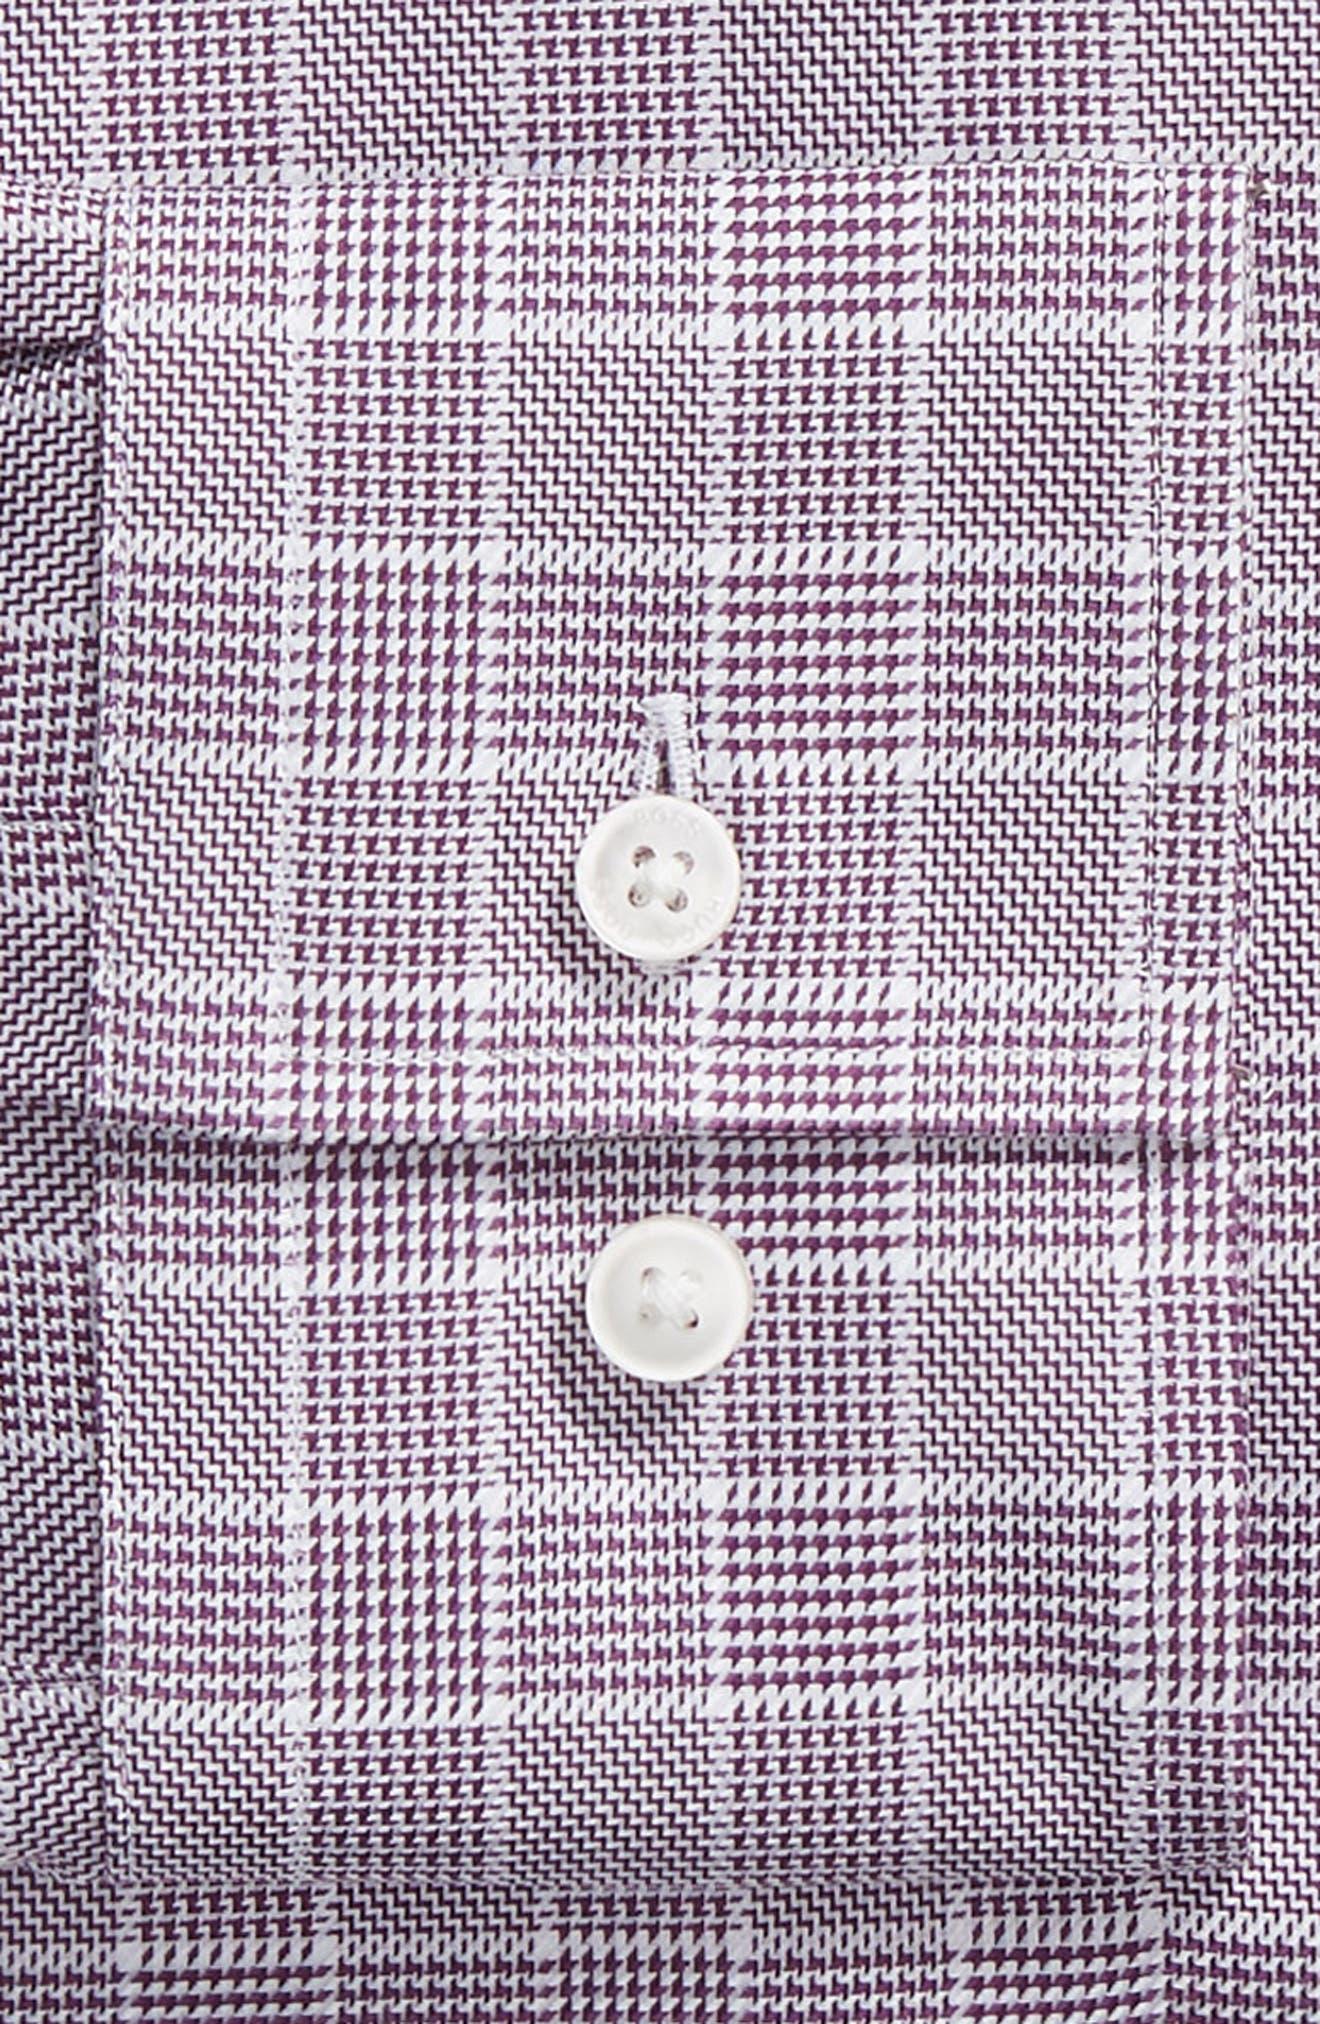 Jason Slim Fit Plaid Dress Shirt,                             Alternate thumbnail 6, color,                             504 PURPLE